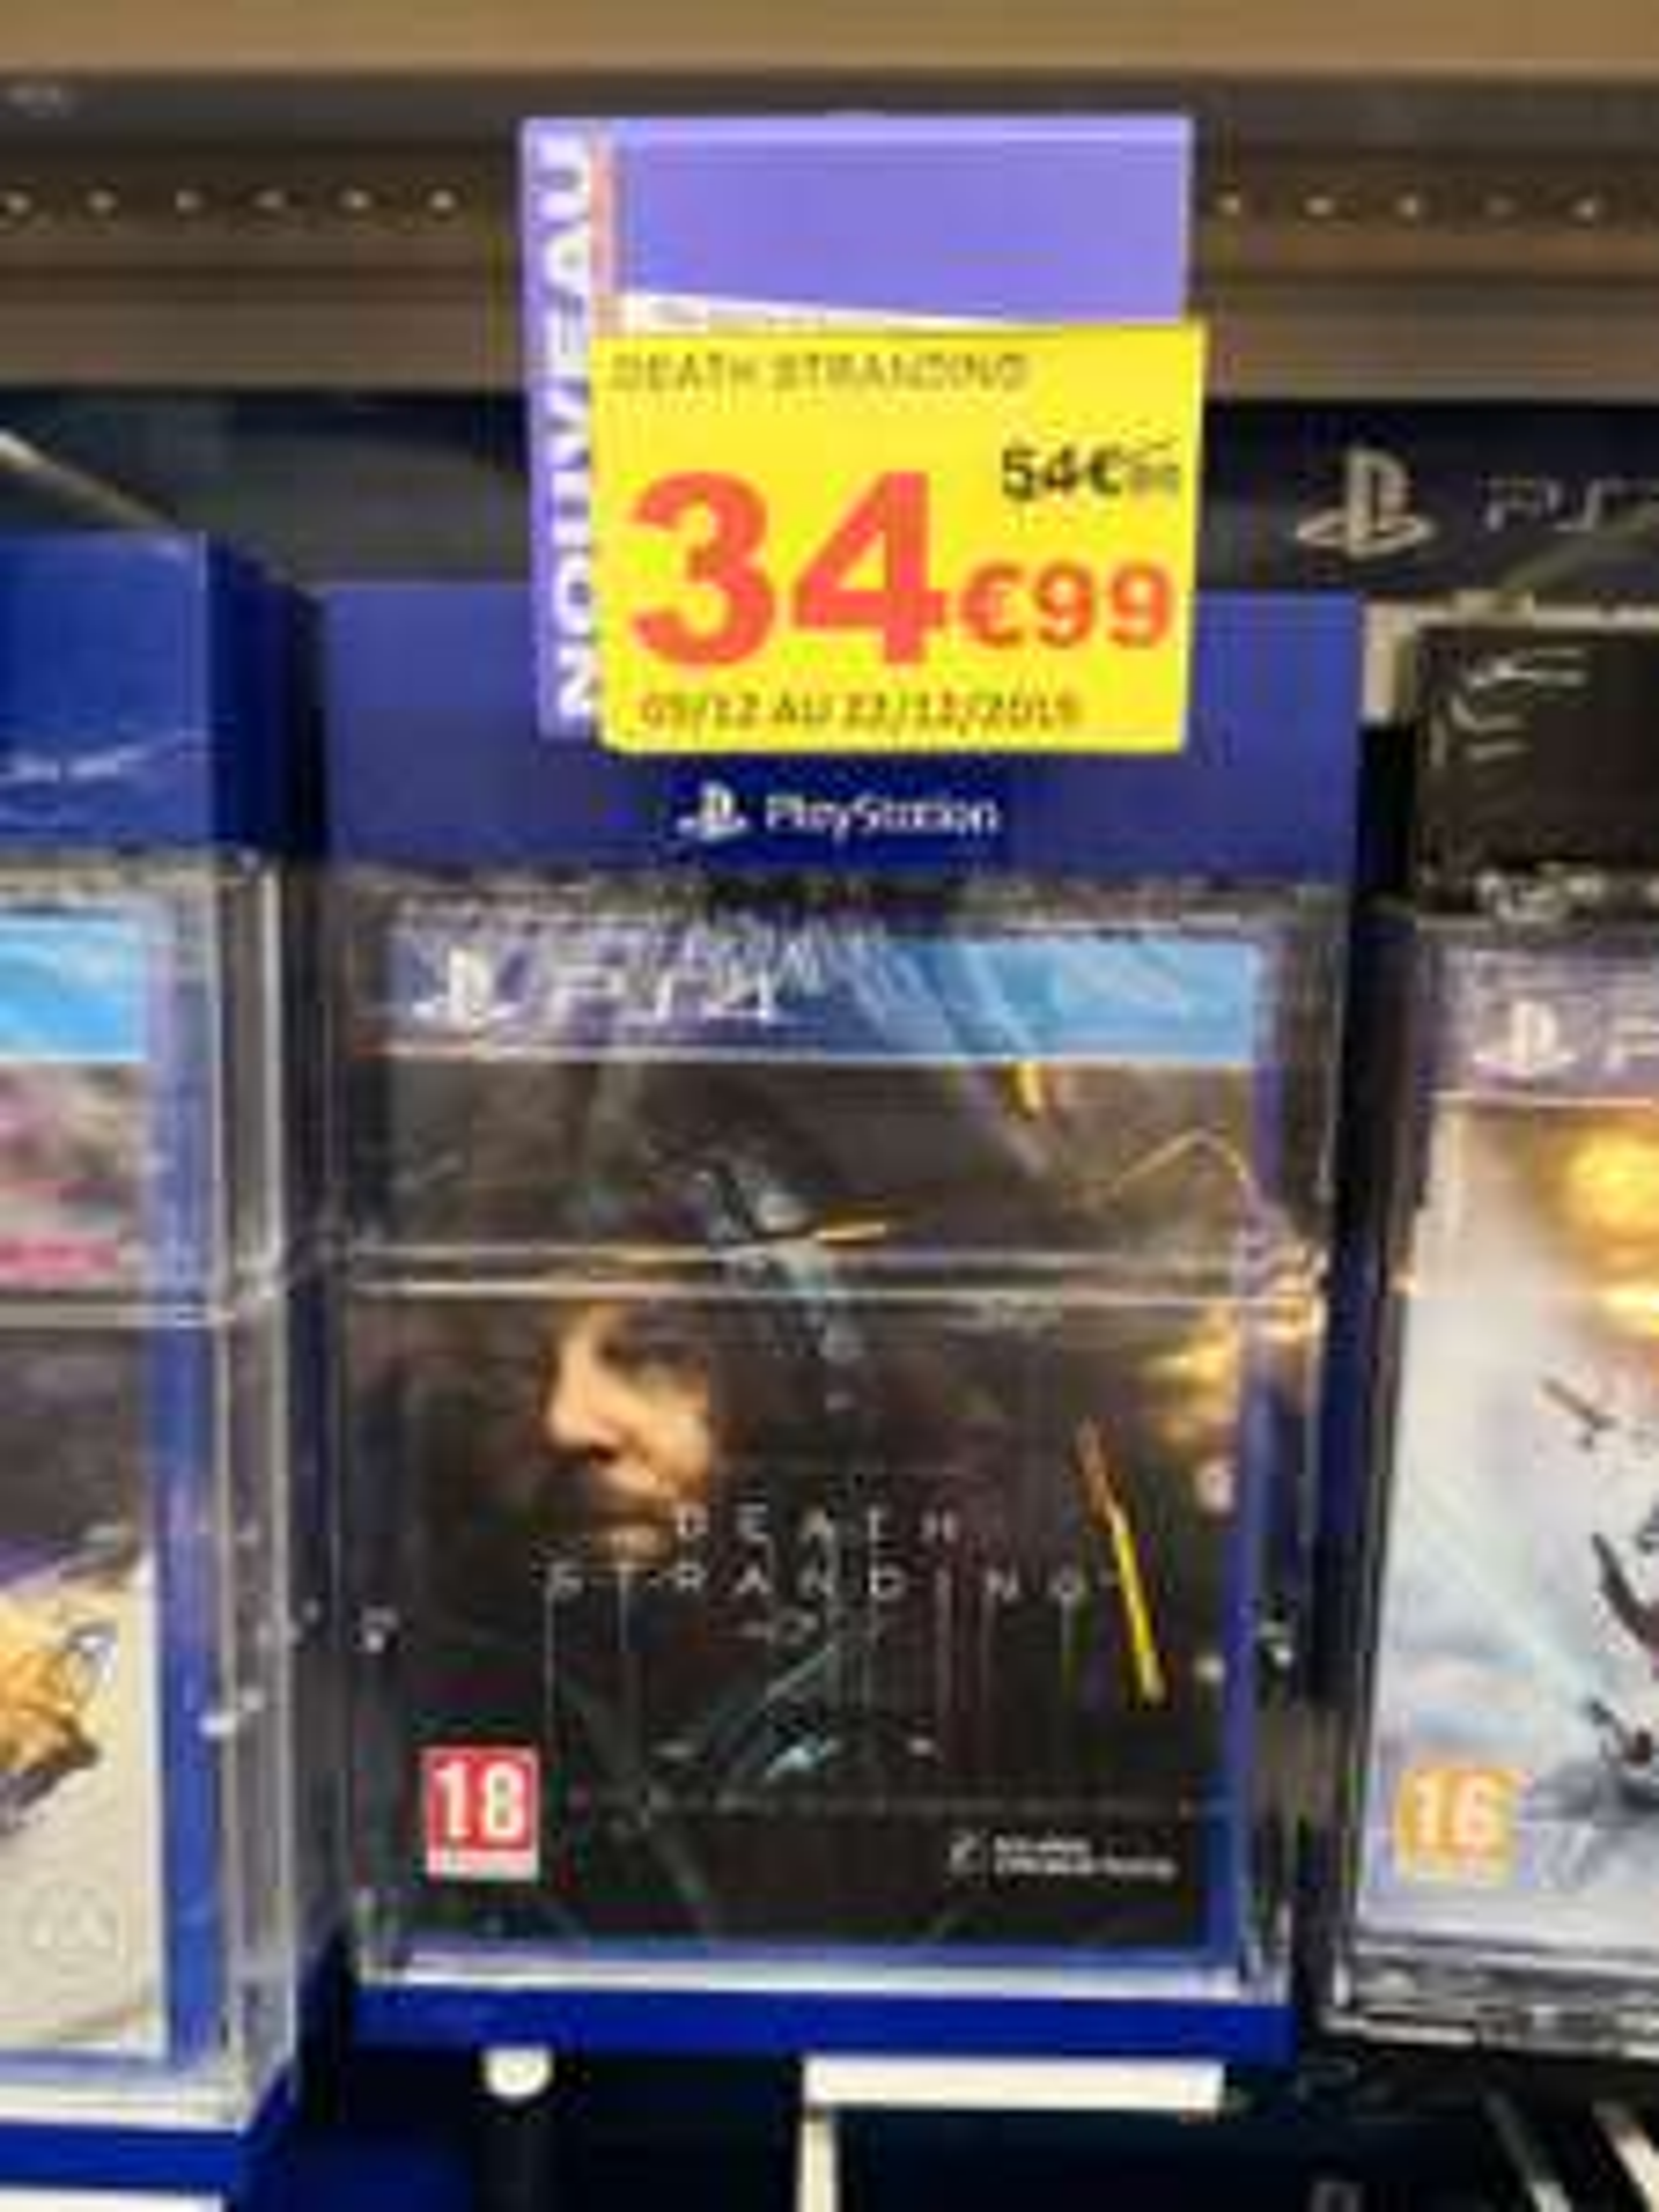 Death Stranding sur PS4 - Épagny (74)